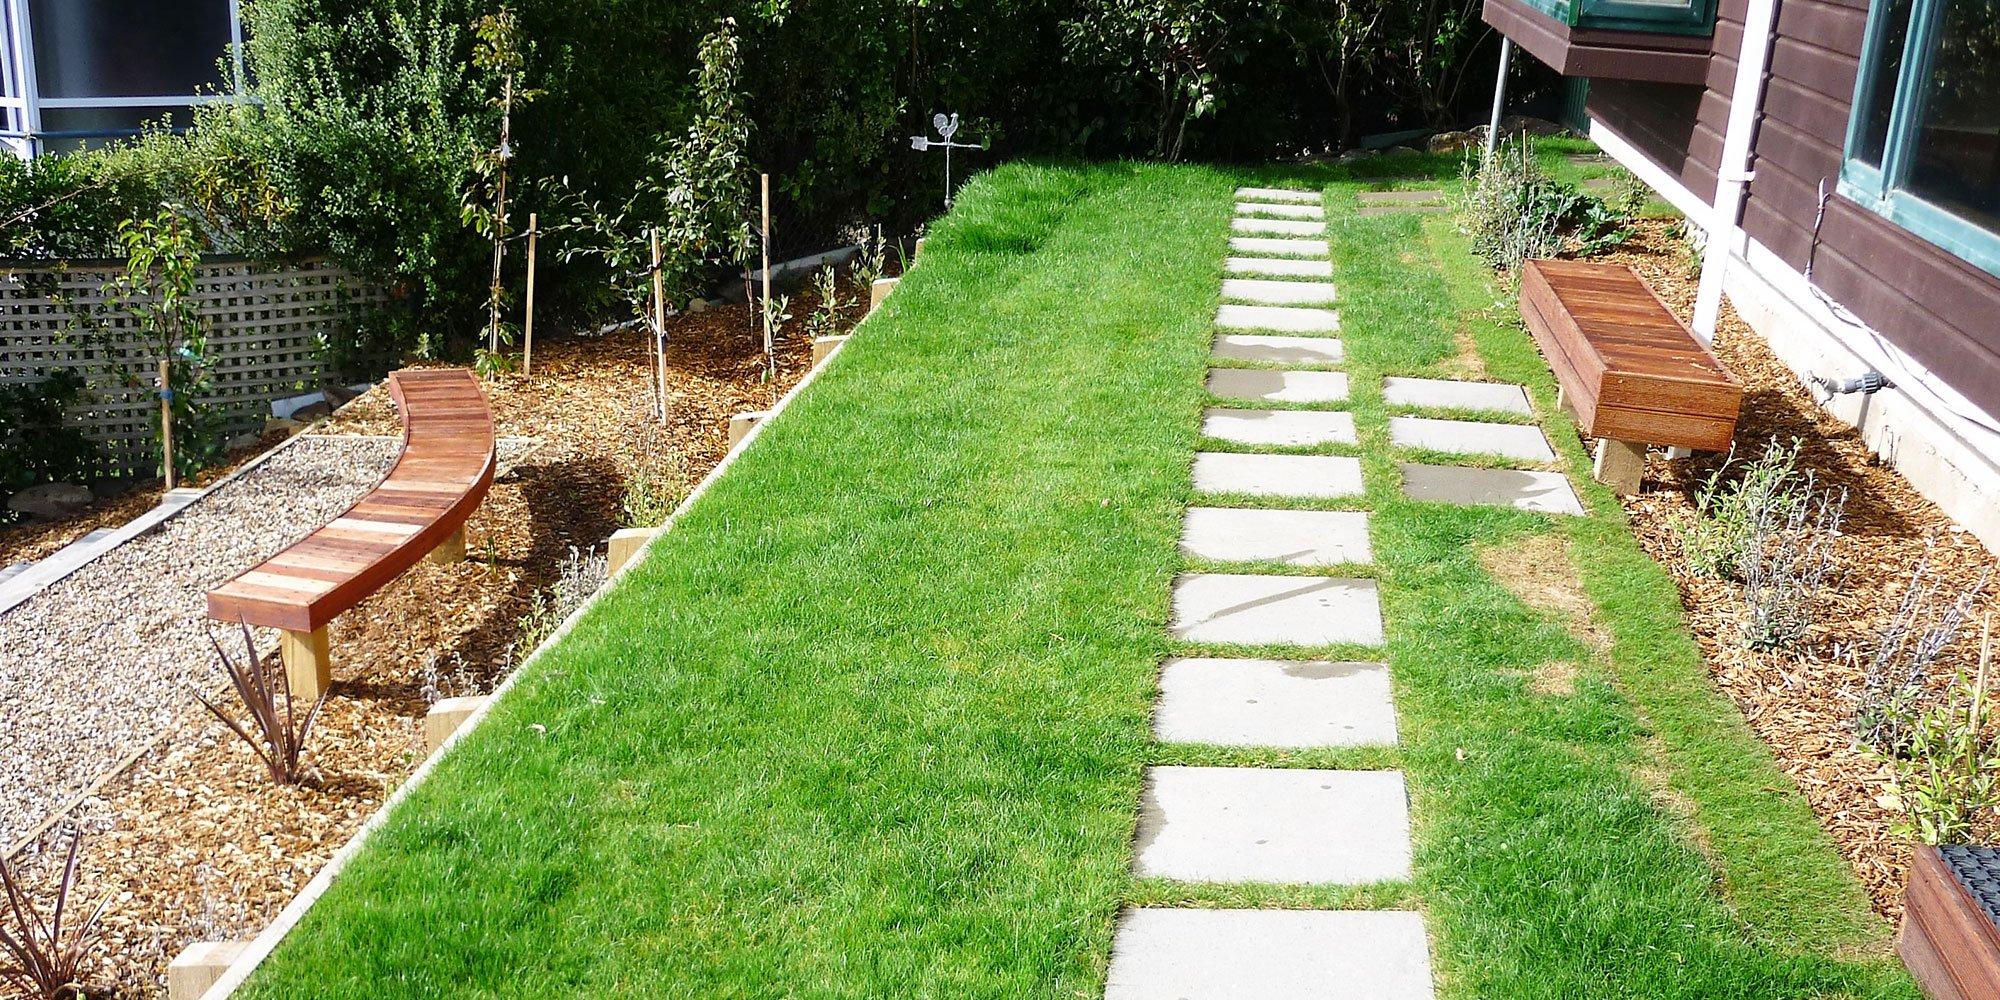 L j landscape contractors landscaping christchurch for Landscaping chch